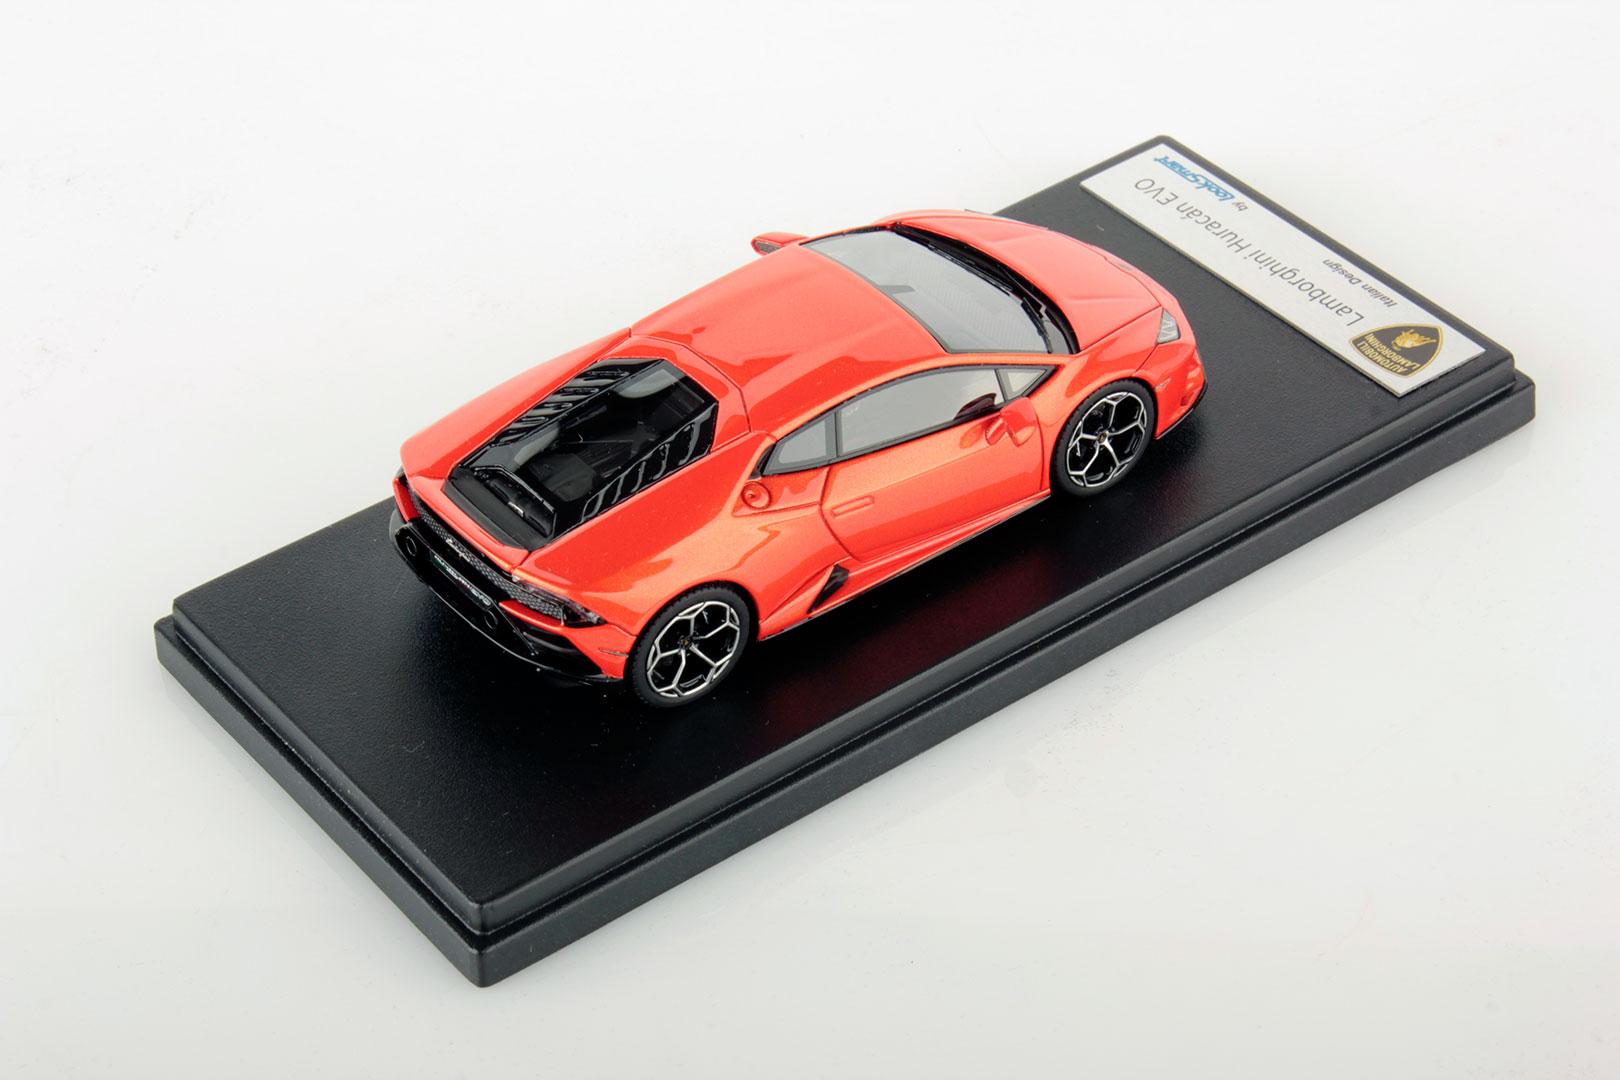 Lamborghini Huracan Evo miniature (2)